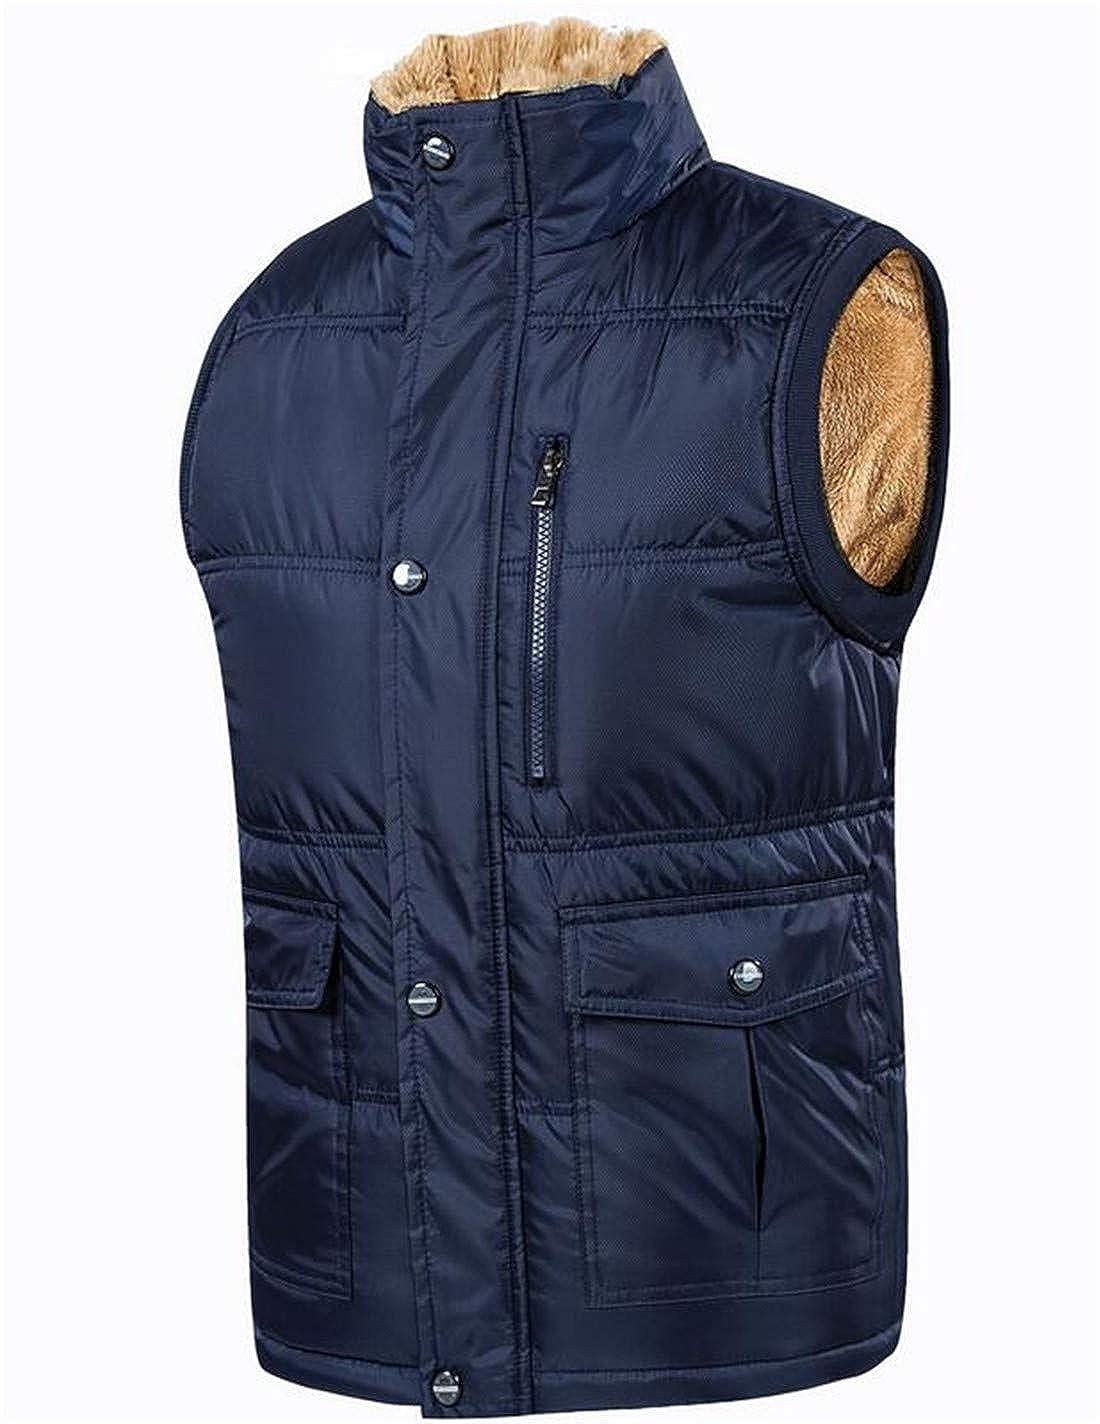 BU2H Men Sleeveless Vest Fleece Lined Down Puffer Jacket Coat